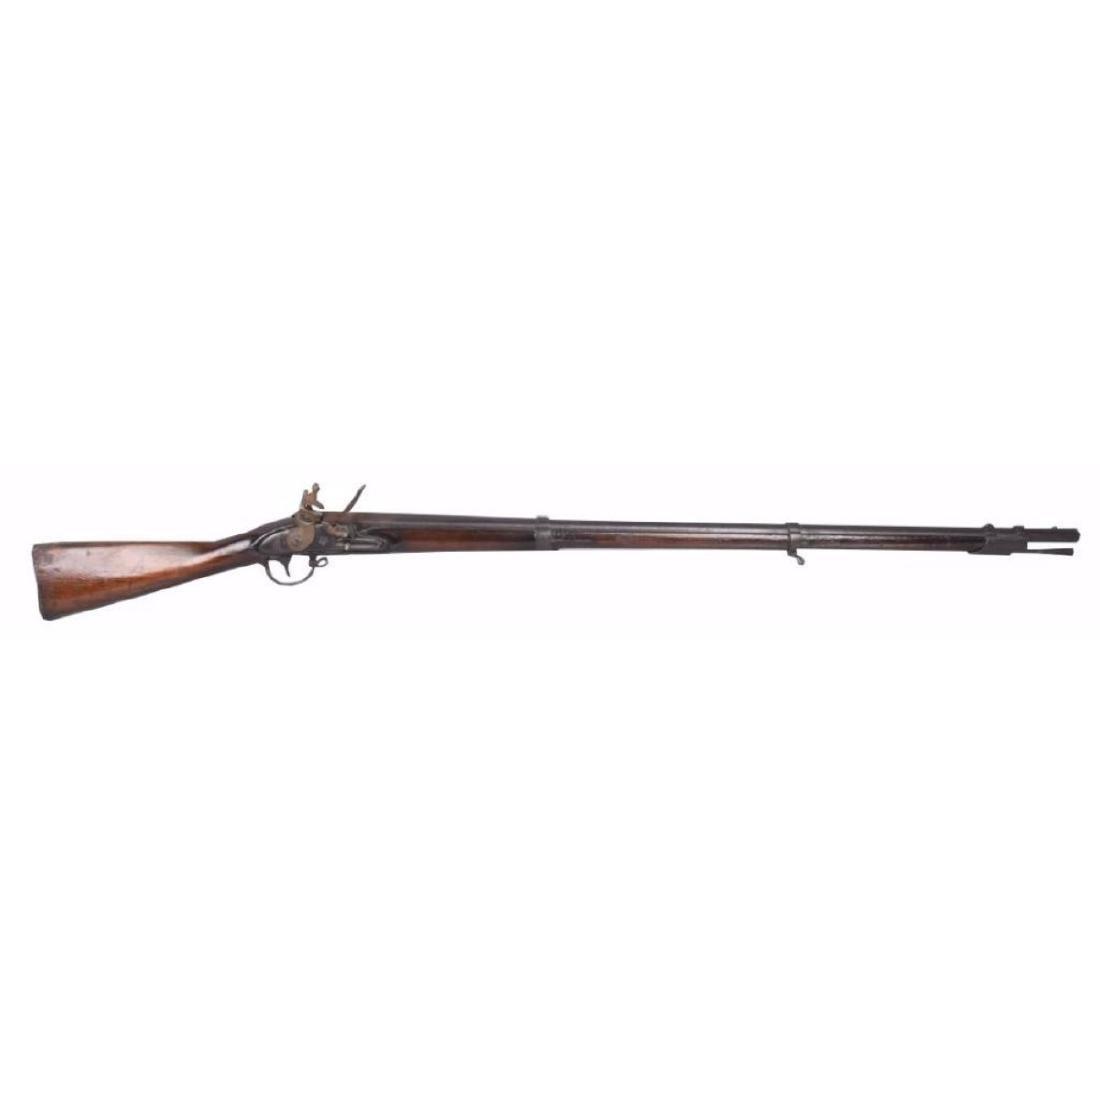 Rare U.S. 1816 HARPERS FERRY .69 caliber MUSKET - 7